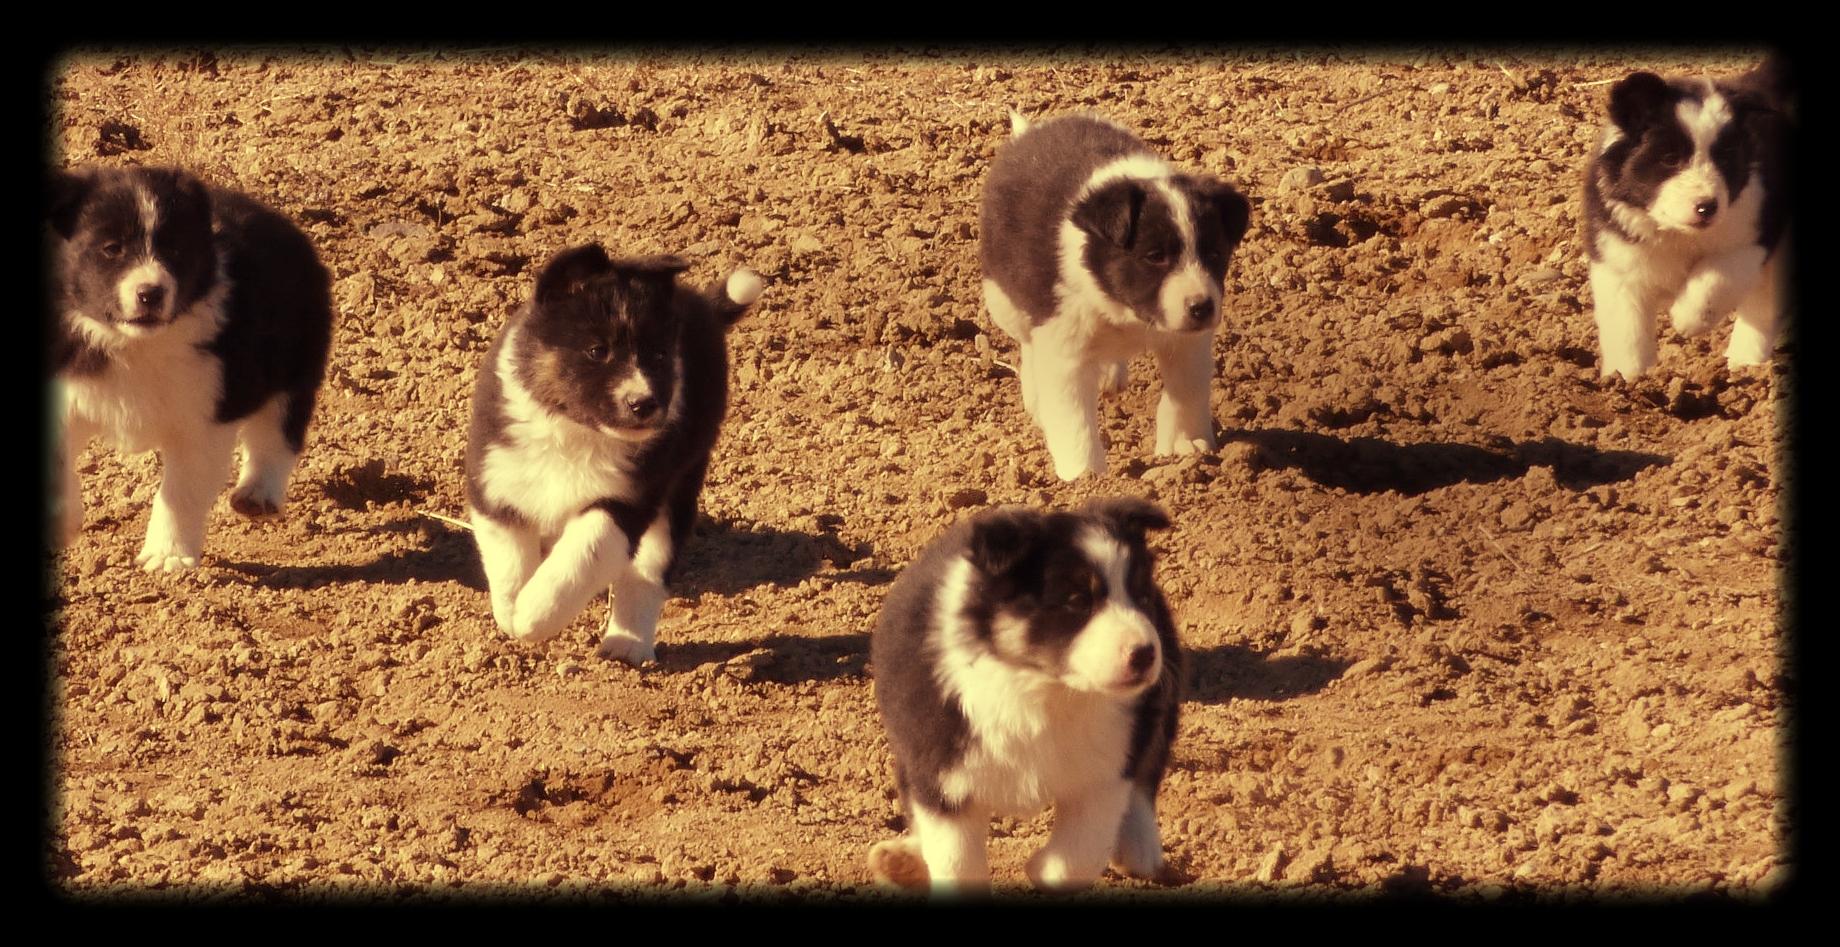 Border Collie Puppies: IMP LAD (Debi Fesler)  PAINT (Jo Woodbury)  DOT (Randy & Janet Lester)  ROY (Felicia K. Whalen)  MOLLY (Jo Woodbury)  TESS (Kennard Bisett)  BOB (R.W. Glasgow)  L-V BOB (Russ & Diane Baquet)  JETTA (Bryan Baquet)  BWLCH HEMP (Mrs. C.S. Rundle)  MEG (Mark Ramsden)  NAN (Terry Mendicino)  MCCALLUMS DEETS (Steve Miller)  MCCALLUMS FRECK (Wayne & Sherril Swaim)  MCCALLUMS SPLASH (Eddie Blazek)  MCCALLUMSBRUTE (Richard Wallrath)  MC JUNE (Wayne & Sherril Swaim)  MCCALLUMS BELLE (Tony McCallum)  MCCALLUM PONCHO (Woody & Judy Jackson)  MCCALLUMS LEVI (Woody & Judy Jackson)  MCCALLUMSMISSB (Bob Crouch)  MCCALLUMS M. RIP (Larry Griggs)  HOLLY (Woody & Judy Jackson)  SNOWHILL SADIE (Larry Griggs)  L-V SPOT (Bryan Baquet)  DIAMONDDOTLUCY (Greg Harris & Bryan Baquet)  MATT (Kimberly Dejanovich & Jo Woodbury)  L-V NIKKI (Clyde R. Baquet & Bryan Baquet)  MC STONEY (Gregory R. Harris & Wayne & Sherril Swaim)  MC-DANDY (Gregory R. Harris & Woody & Judy Jackson)